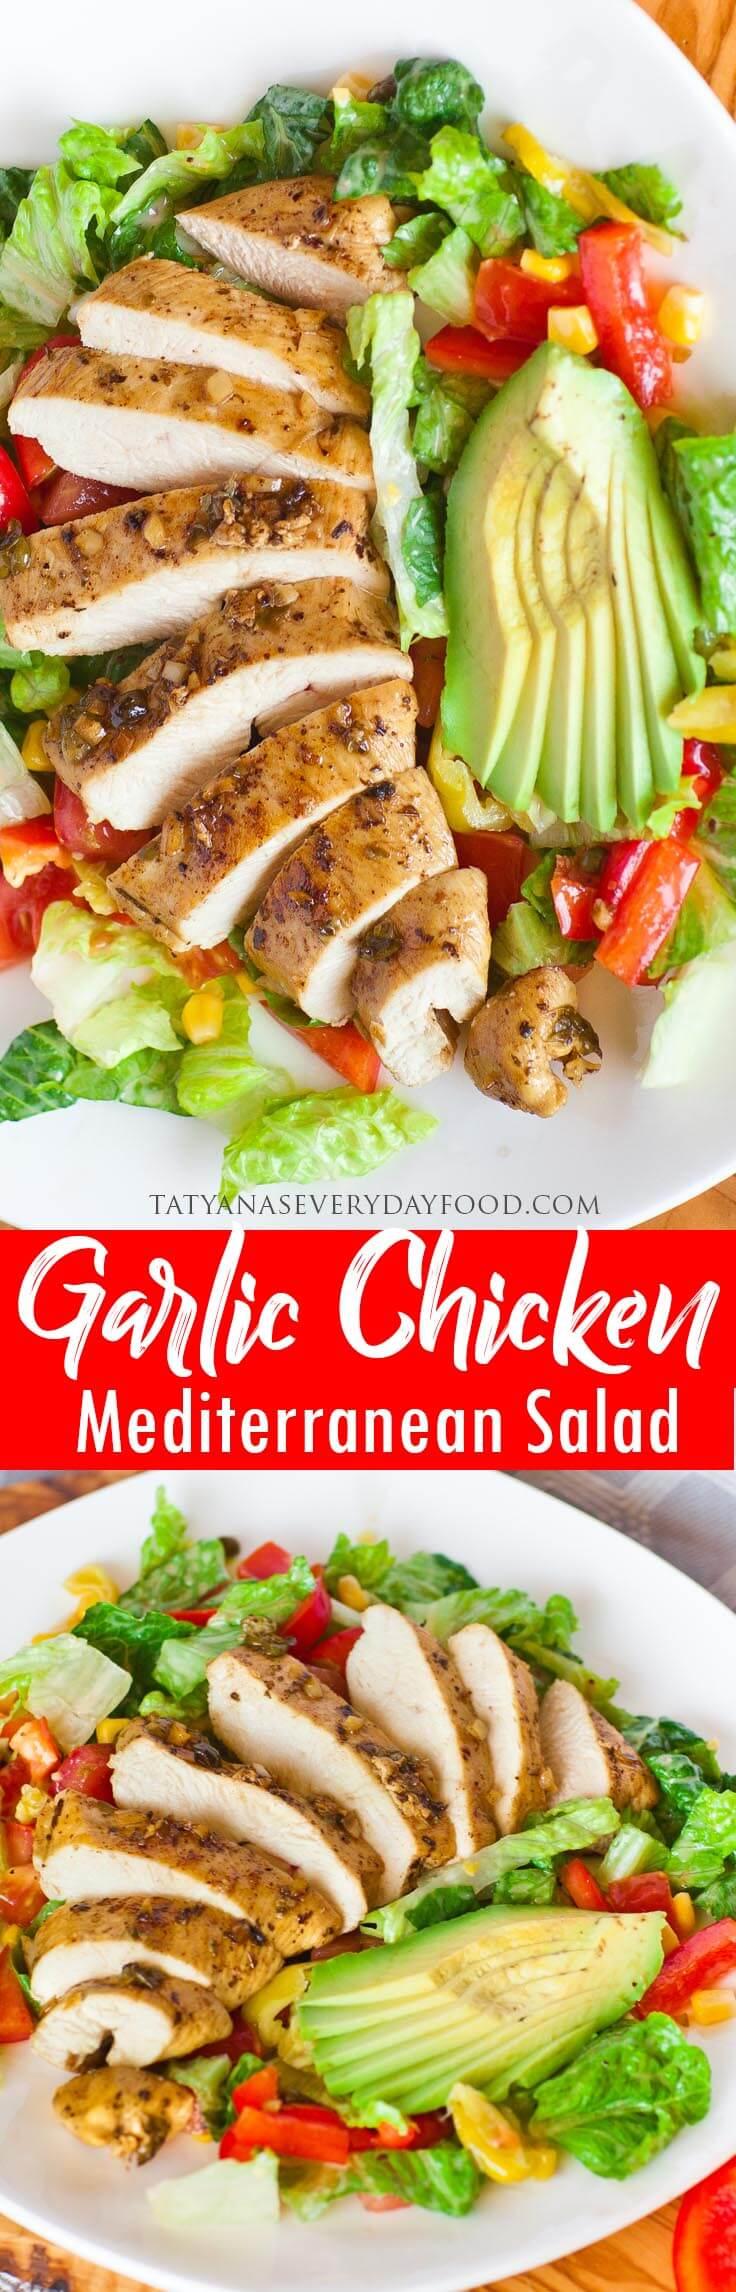 Garlic Chicken Salad video recipe